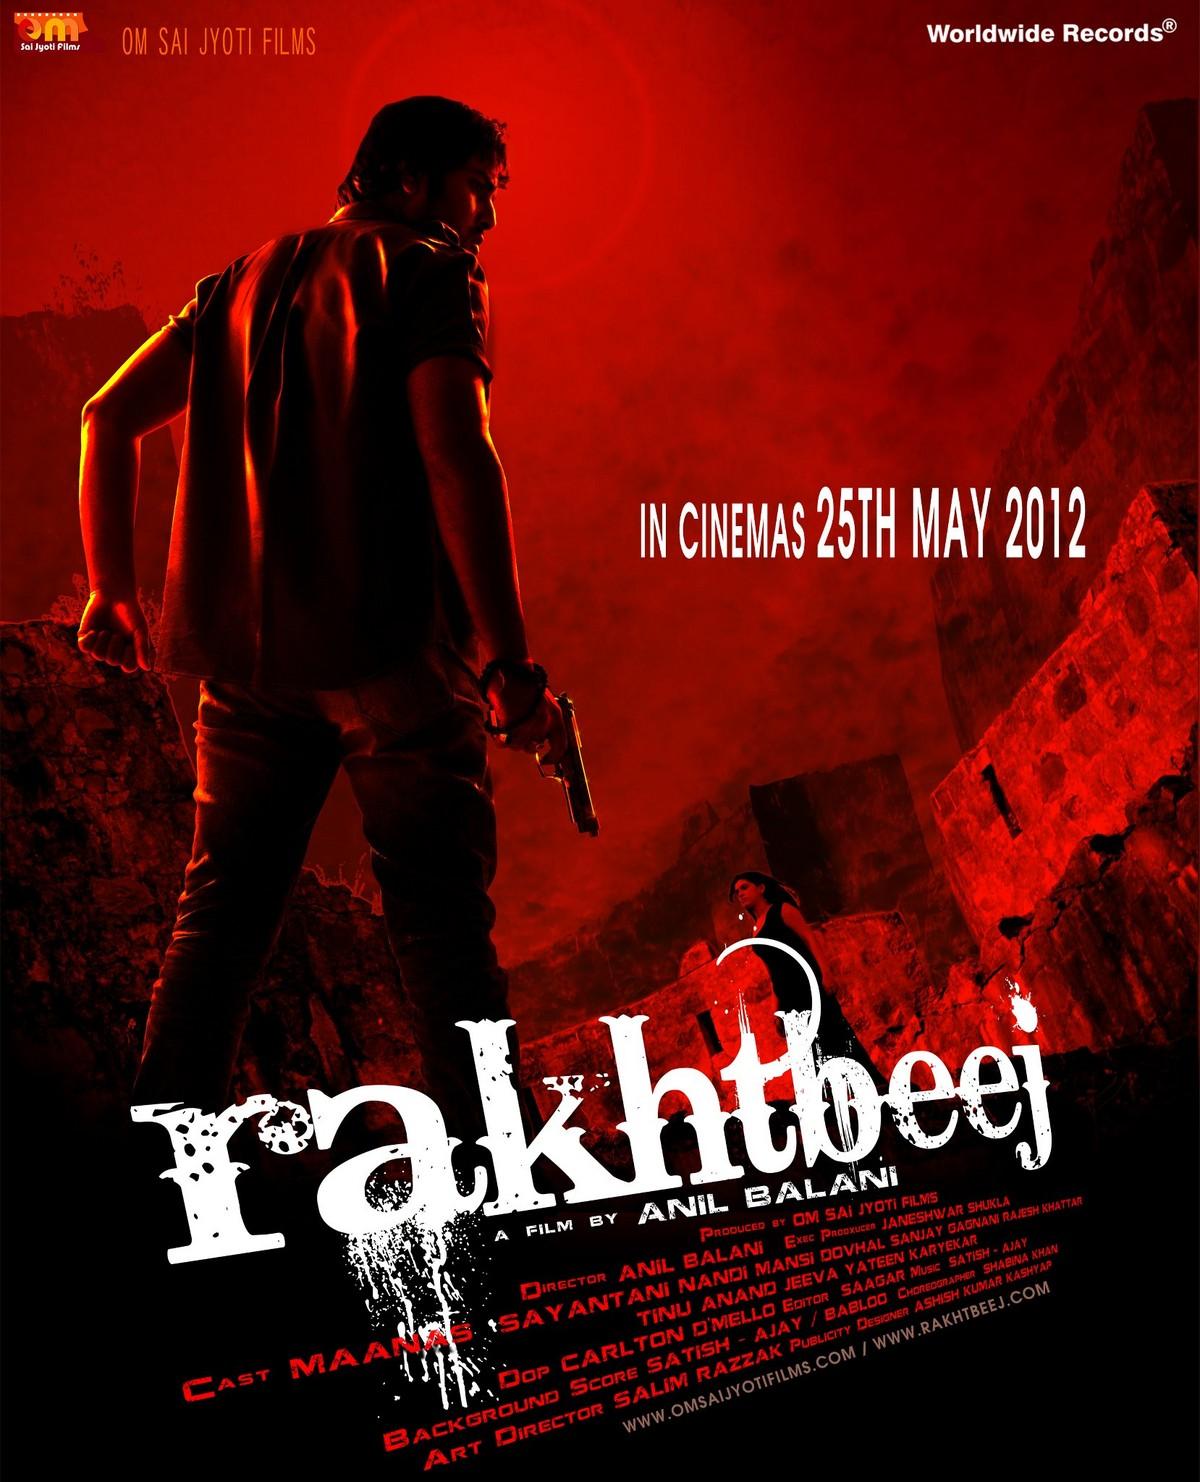 Rakhtbeej - Movie Poster #1 (Original)